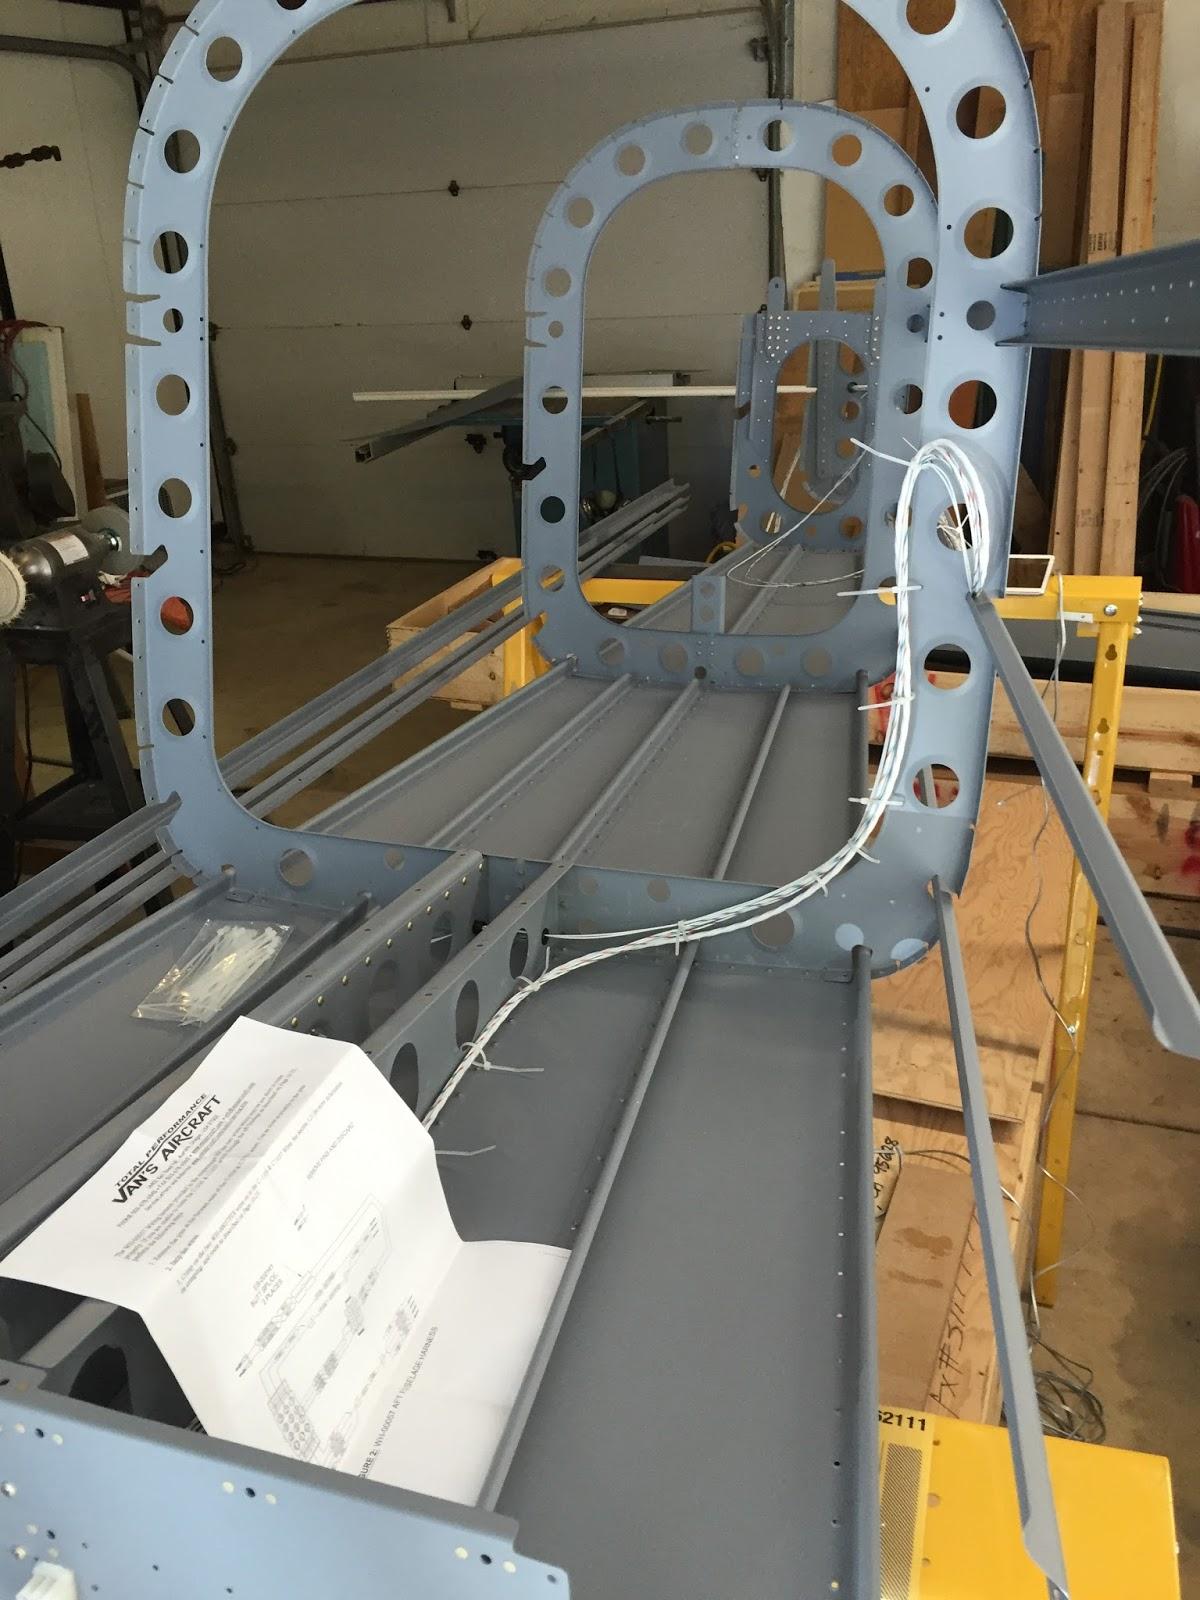 medium resolution of wiring harness skins wiring diagram dom truck wiring harness wiring harness skins